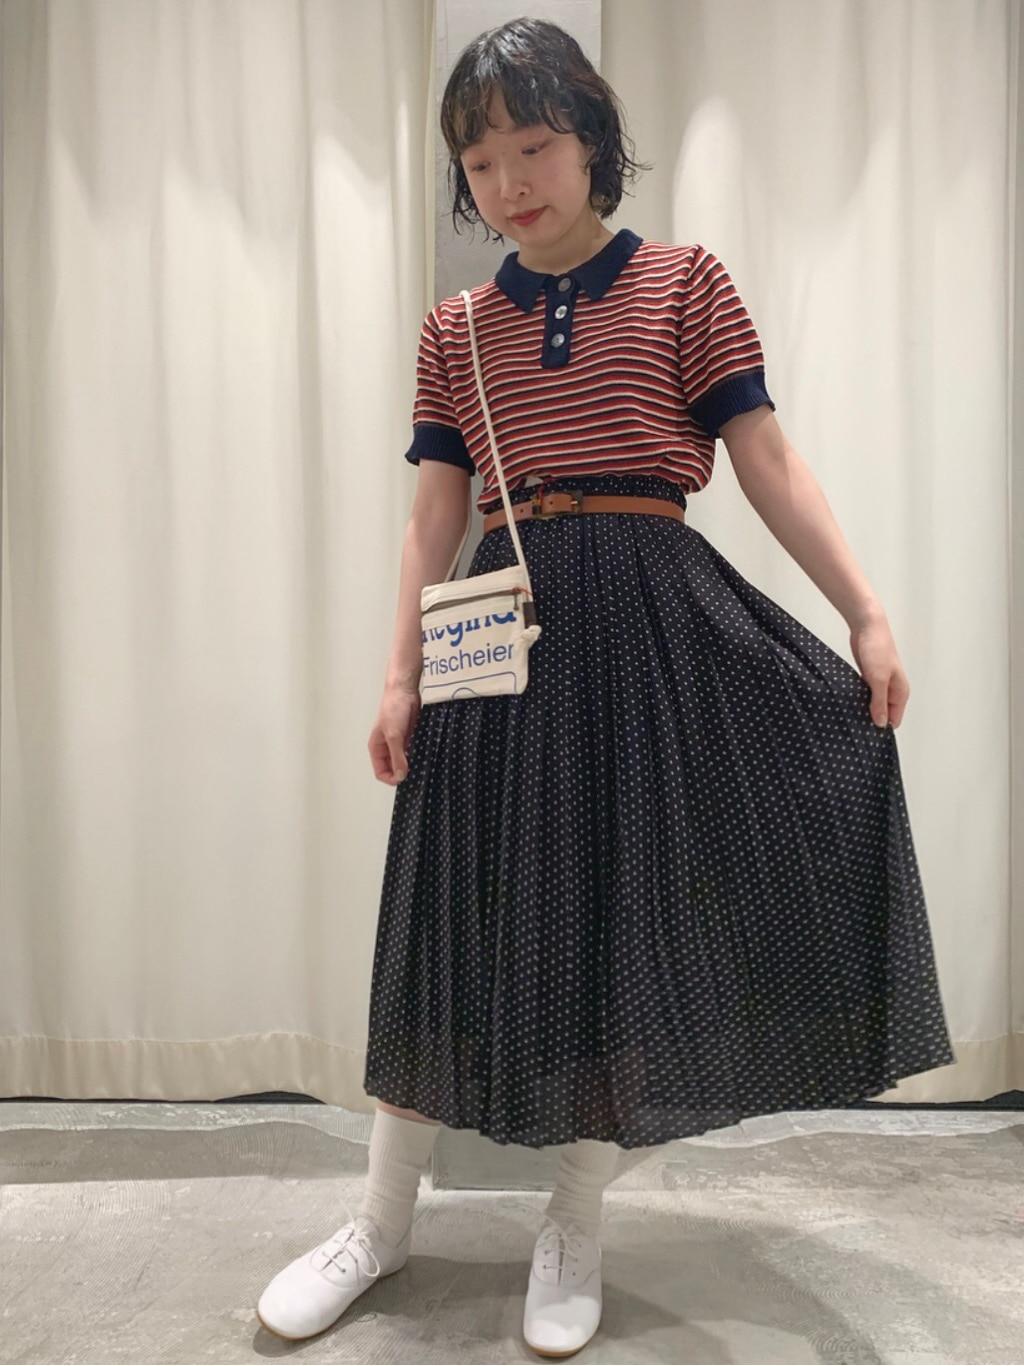 AMB SHOP CHILD WOMAN CHILD WOMAN , PAR ICI ルミネ横浜 身長:158cm 2020.06.15